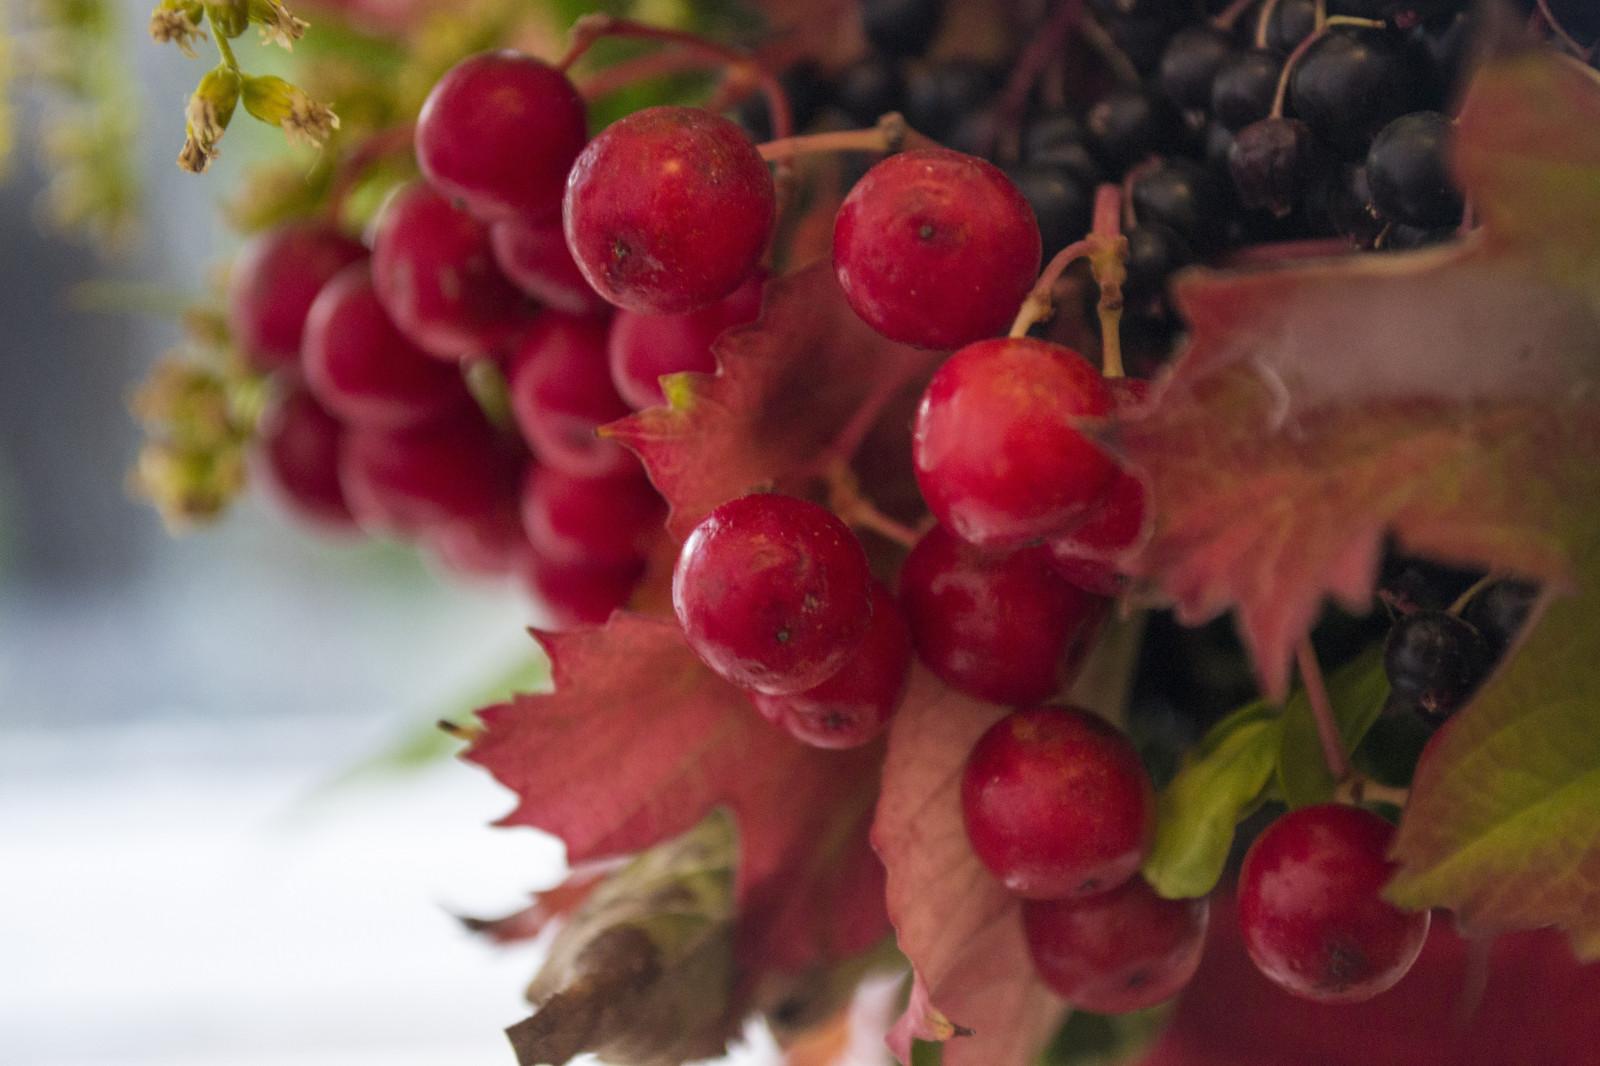 hintergrundbilder lebensmittel blumen rot ast frucht sommer bl hen rote bl tter. Black Bedroom Furniture Sets. Home Design Ideas